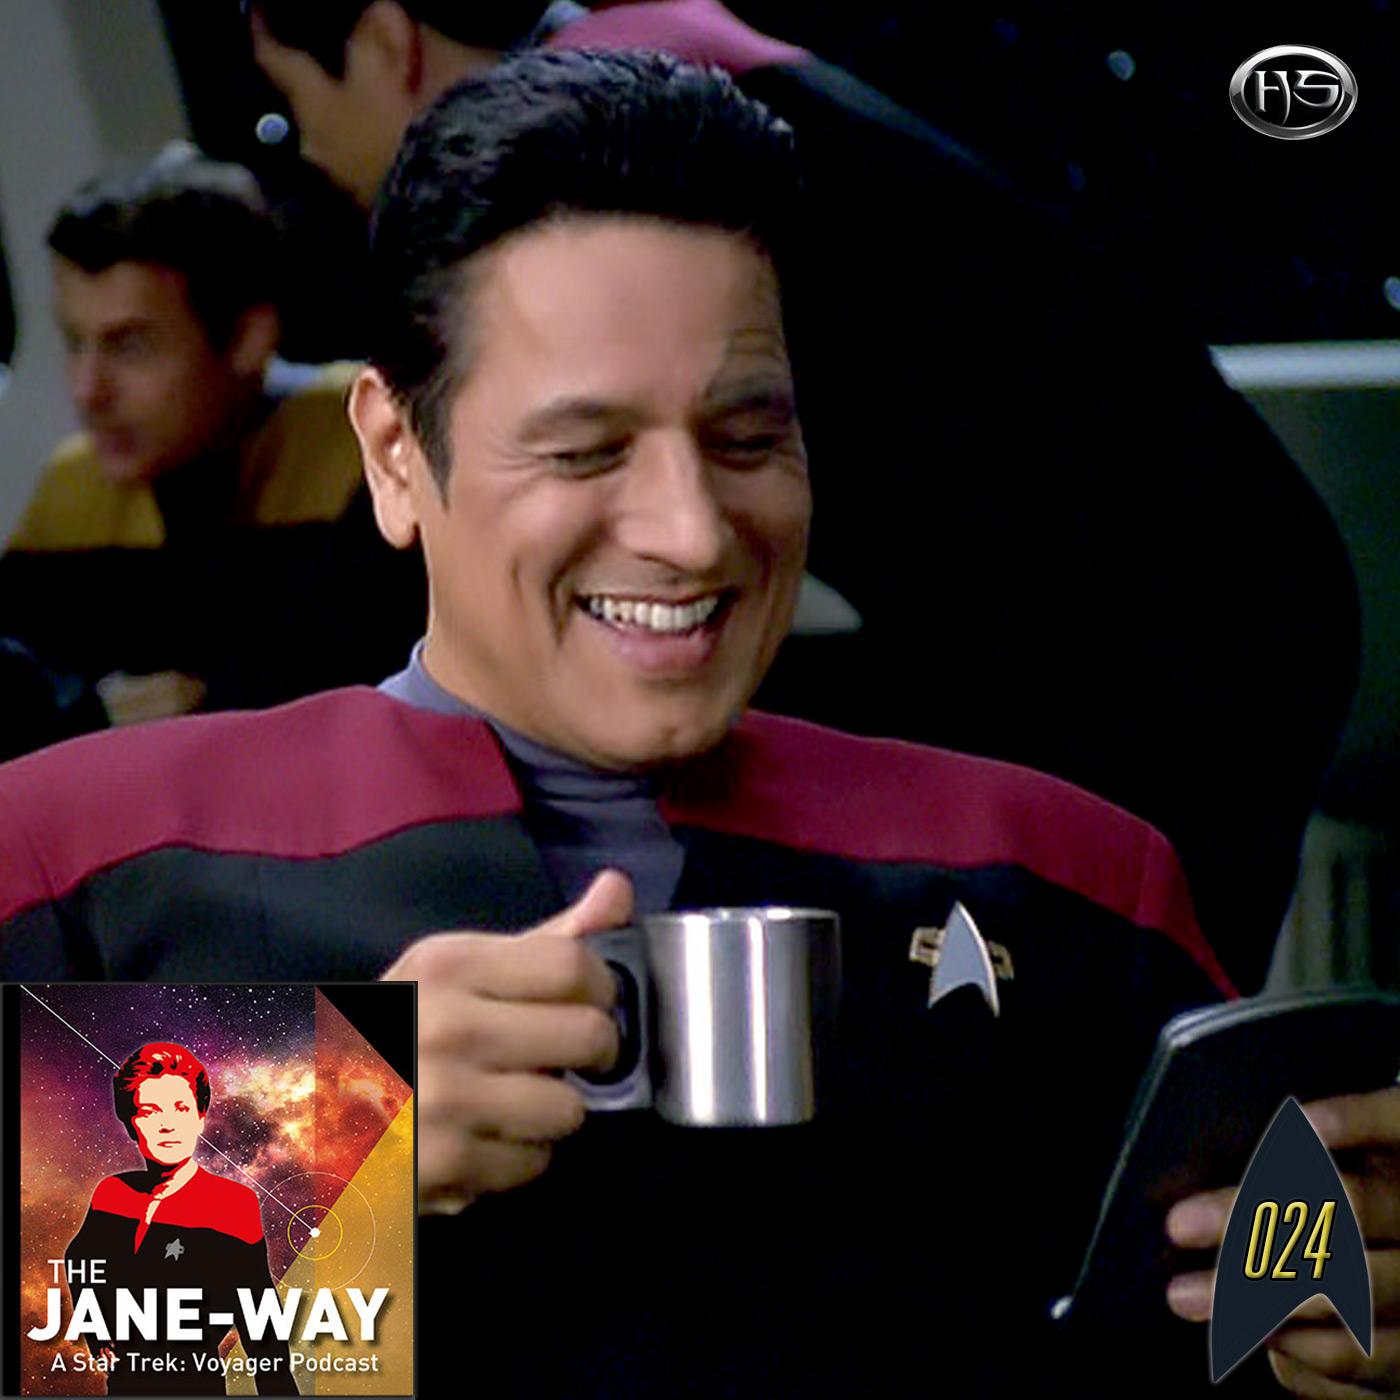 The Jane-Way Episode 24